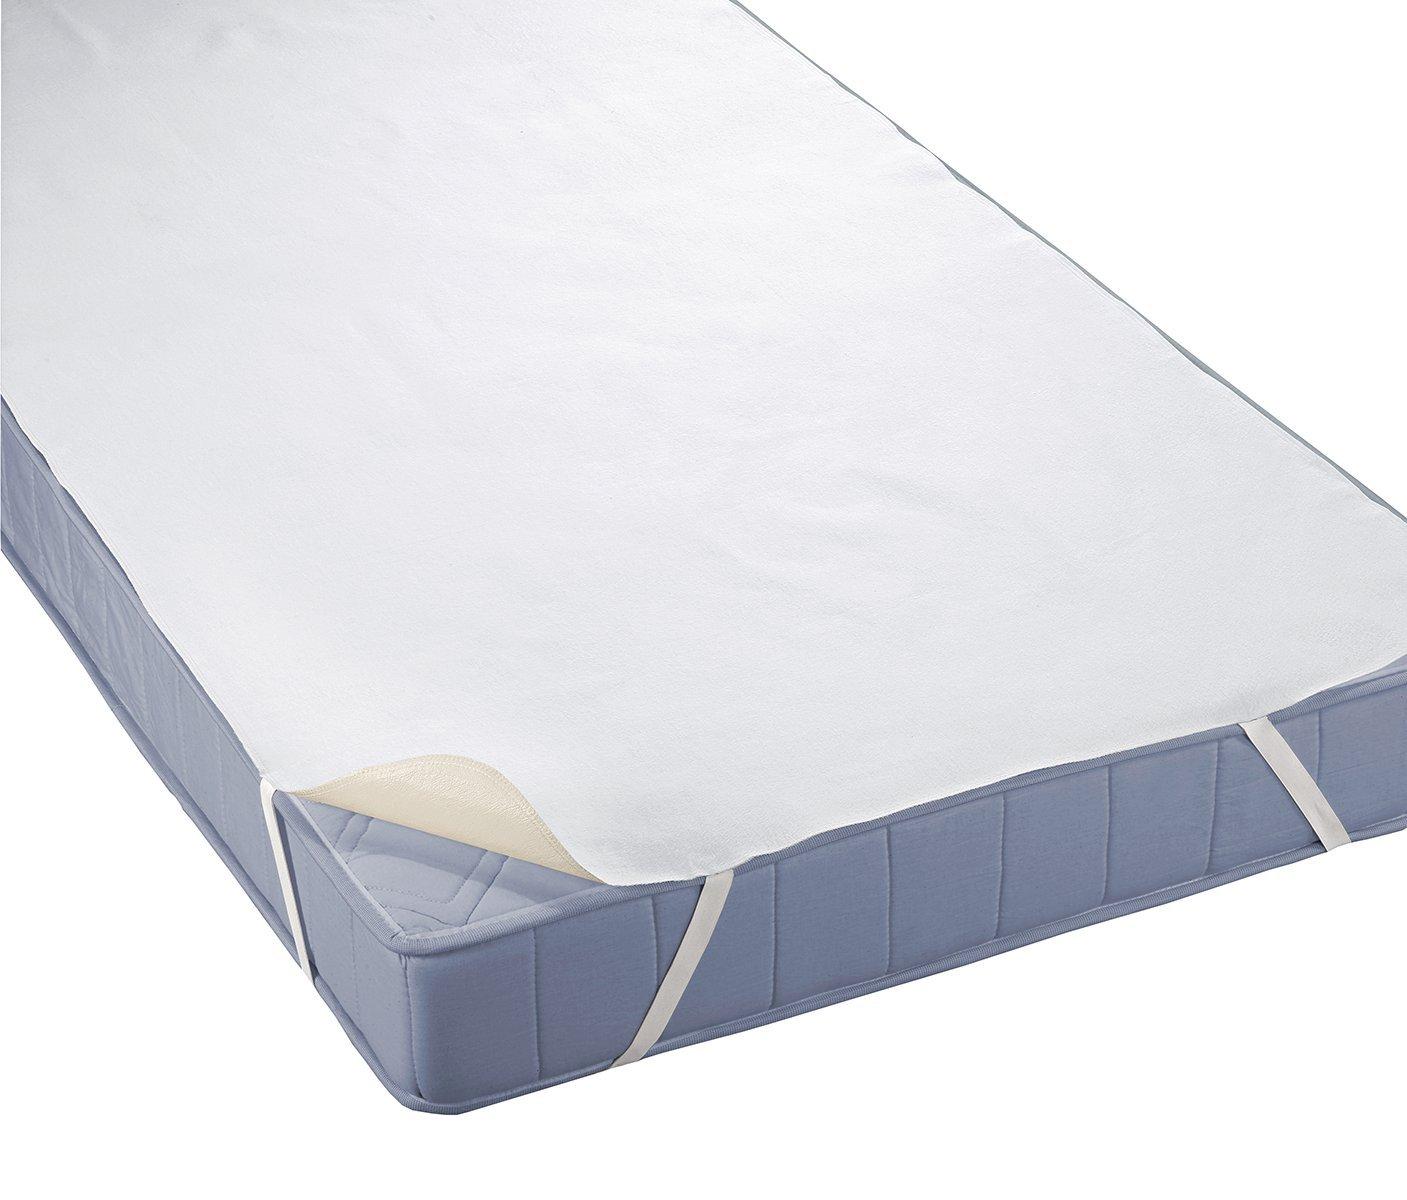 Biberna 809721-001-143 Impermeable Protector//colch/ón Rizo Reversible 3-Capa con Silver 90 x 190 cm Blanco Care